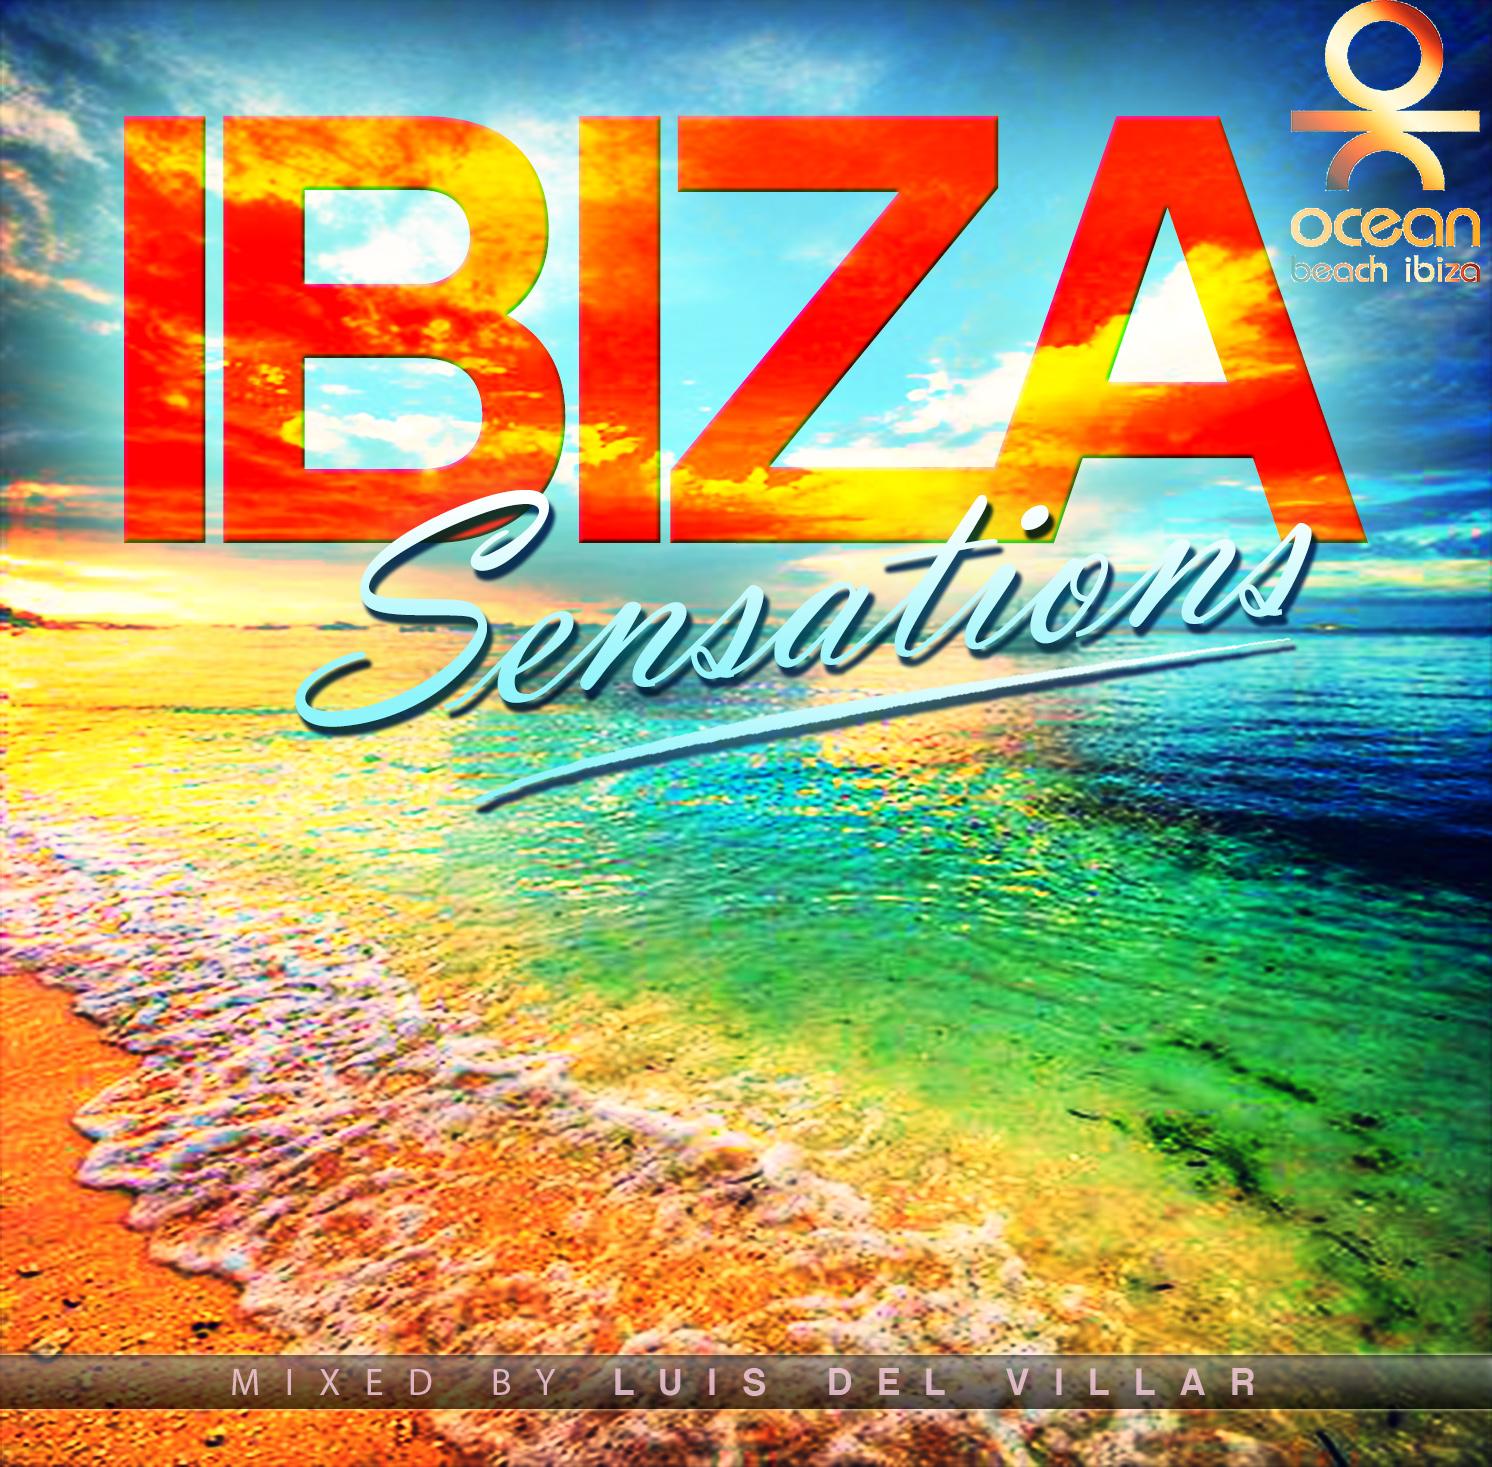 Artwork for Ibiza Sensations 69